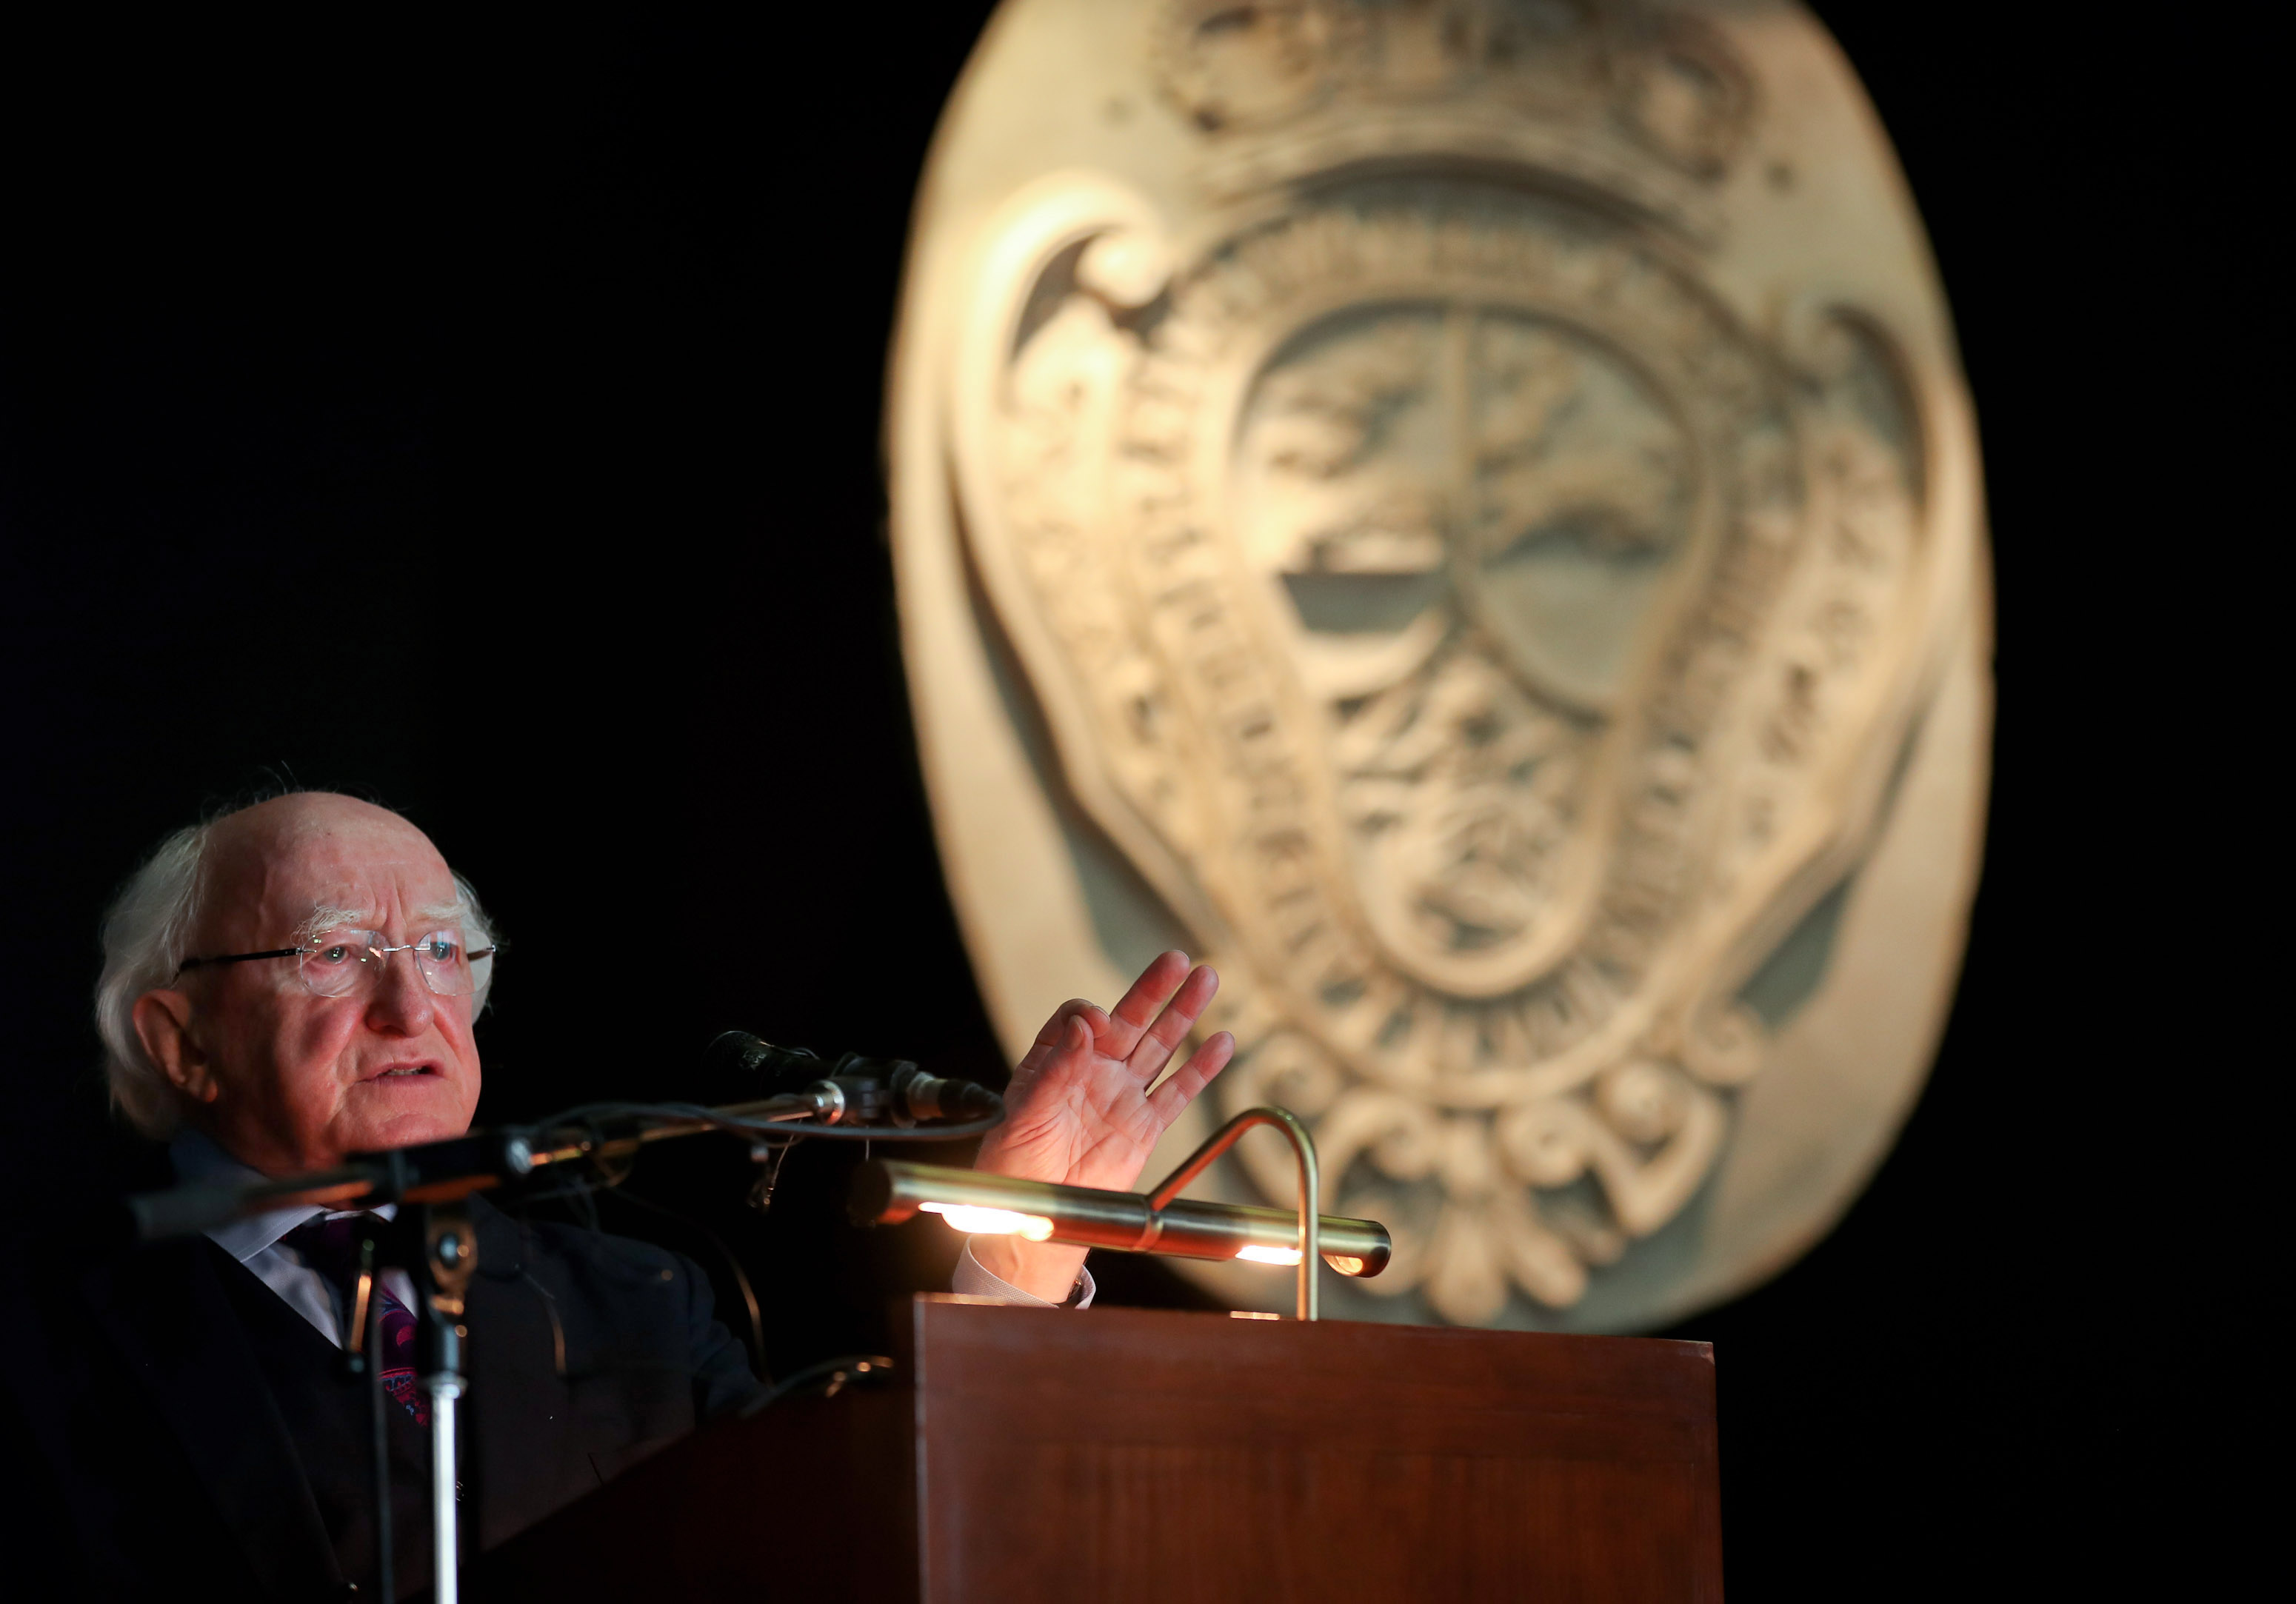 Michael D. Higgins, President of Ireland delivers keynote address to SILAS conference, University of Havana, Cuba